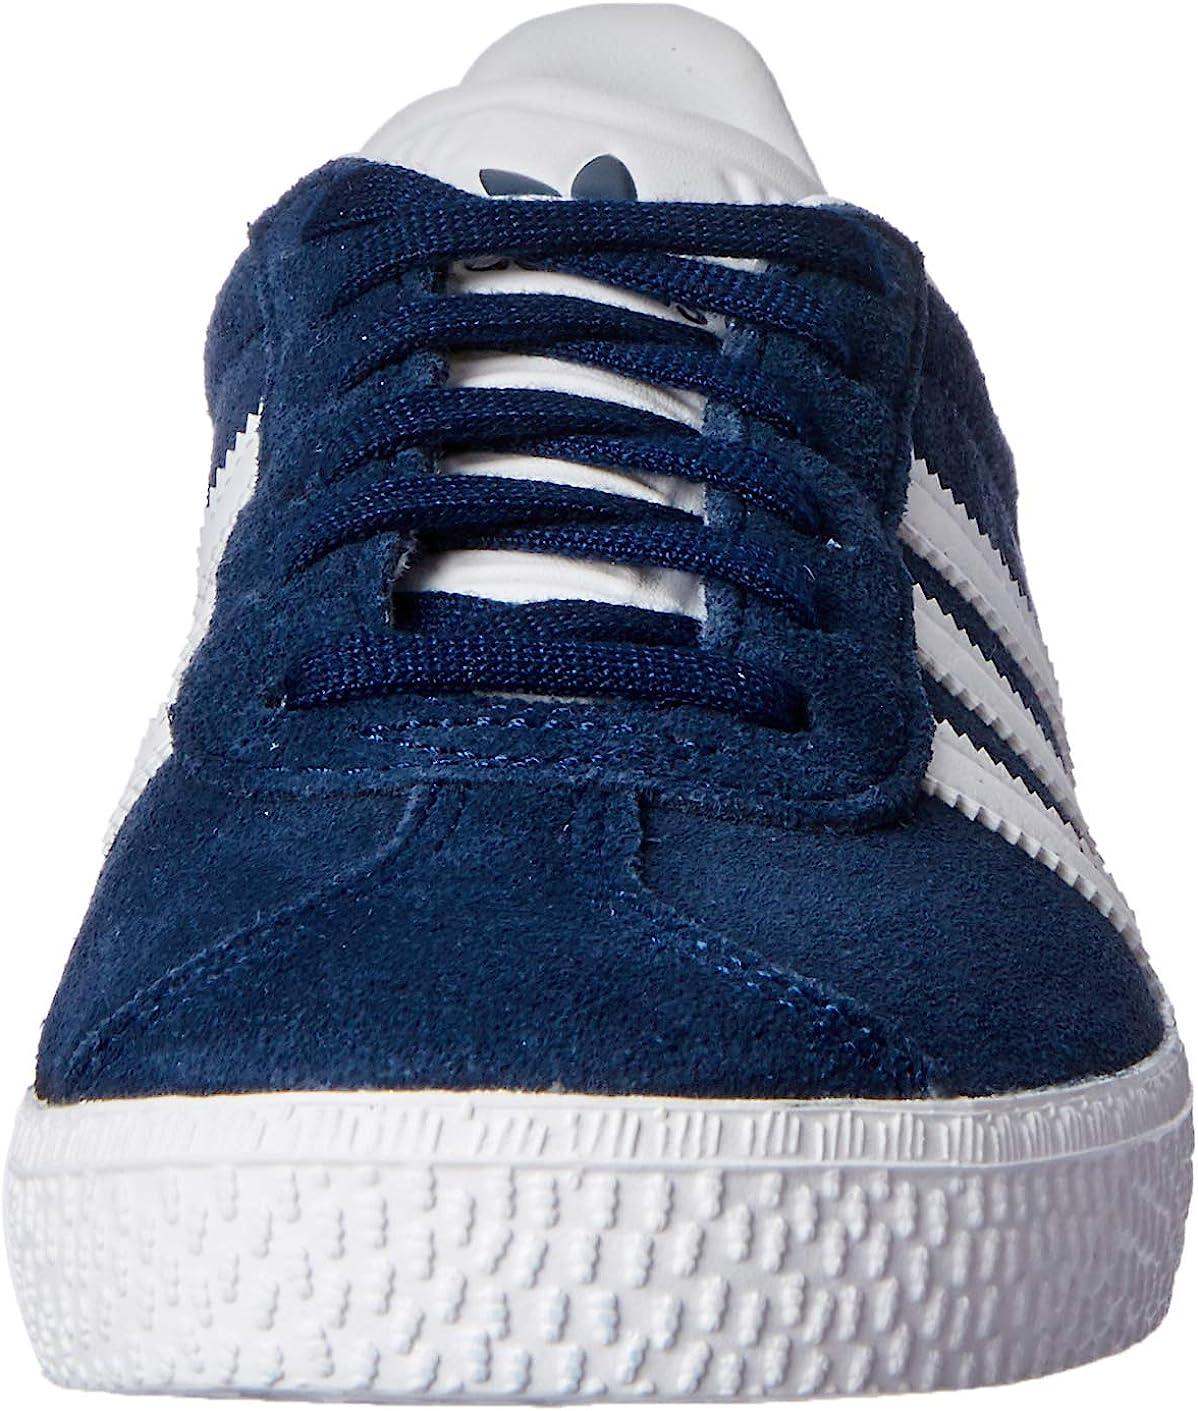 adidas Originals Gazelle 2 Ladies Footwear Black-White Womens Trainers Sneaker Shoes